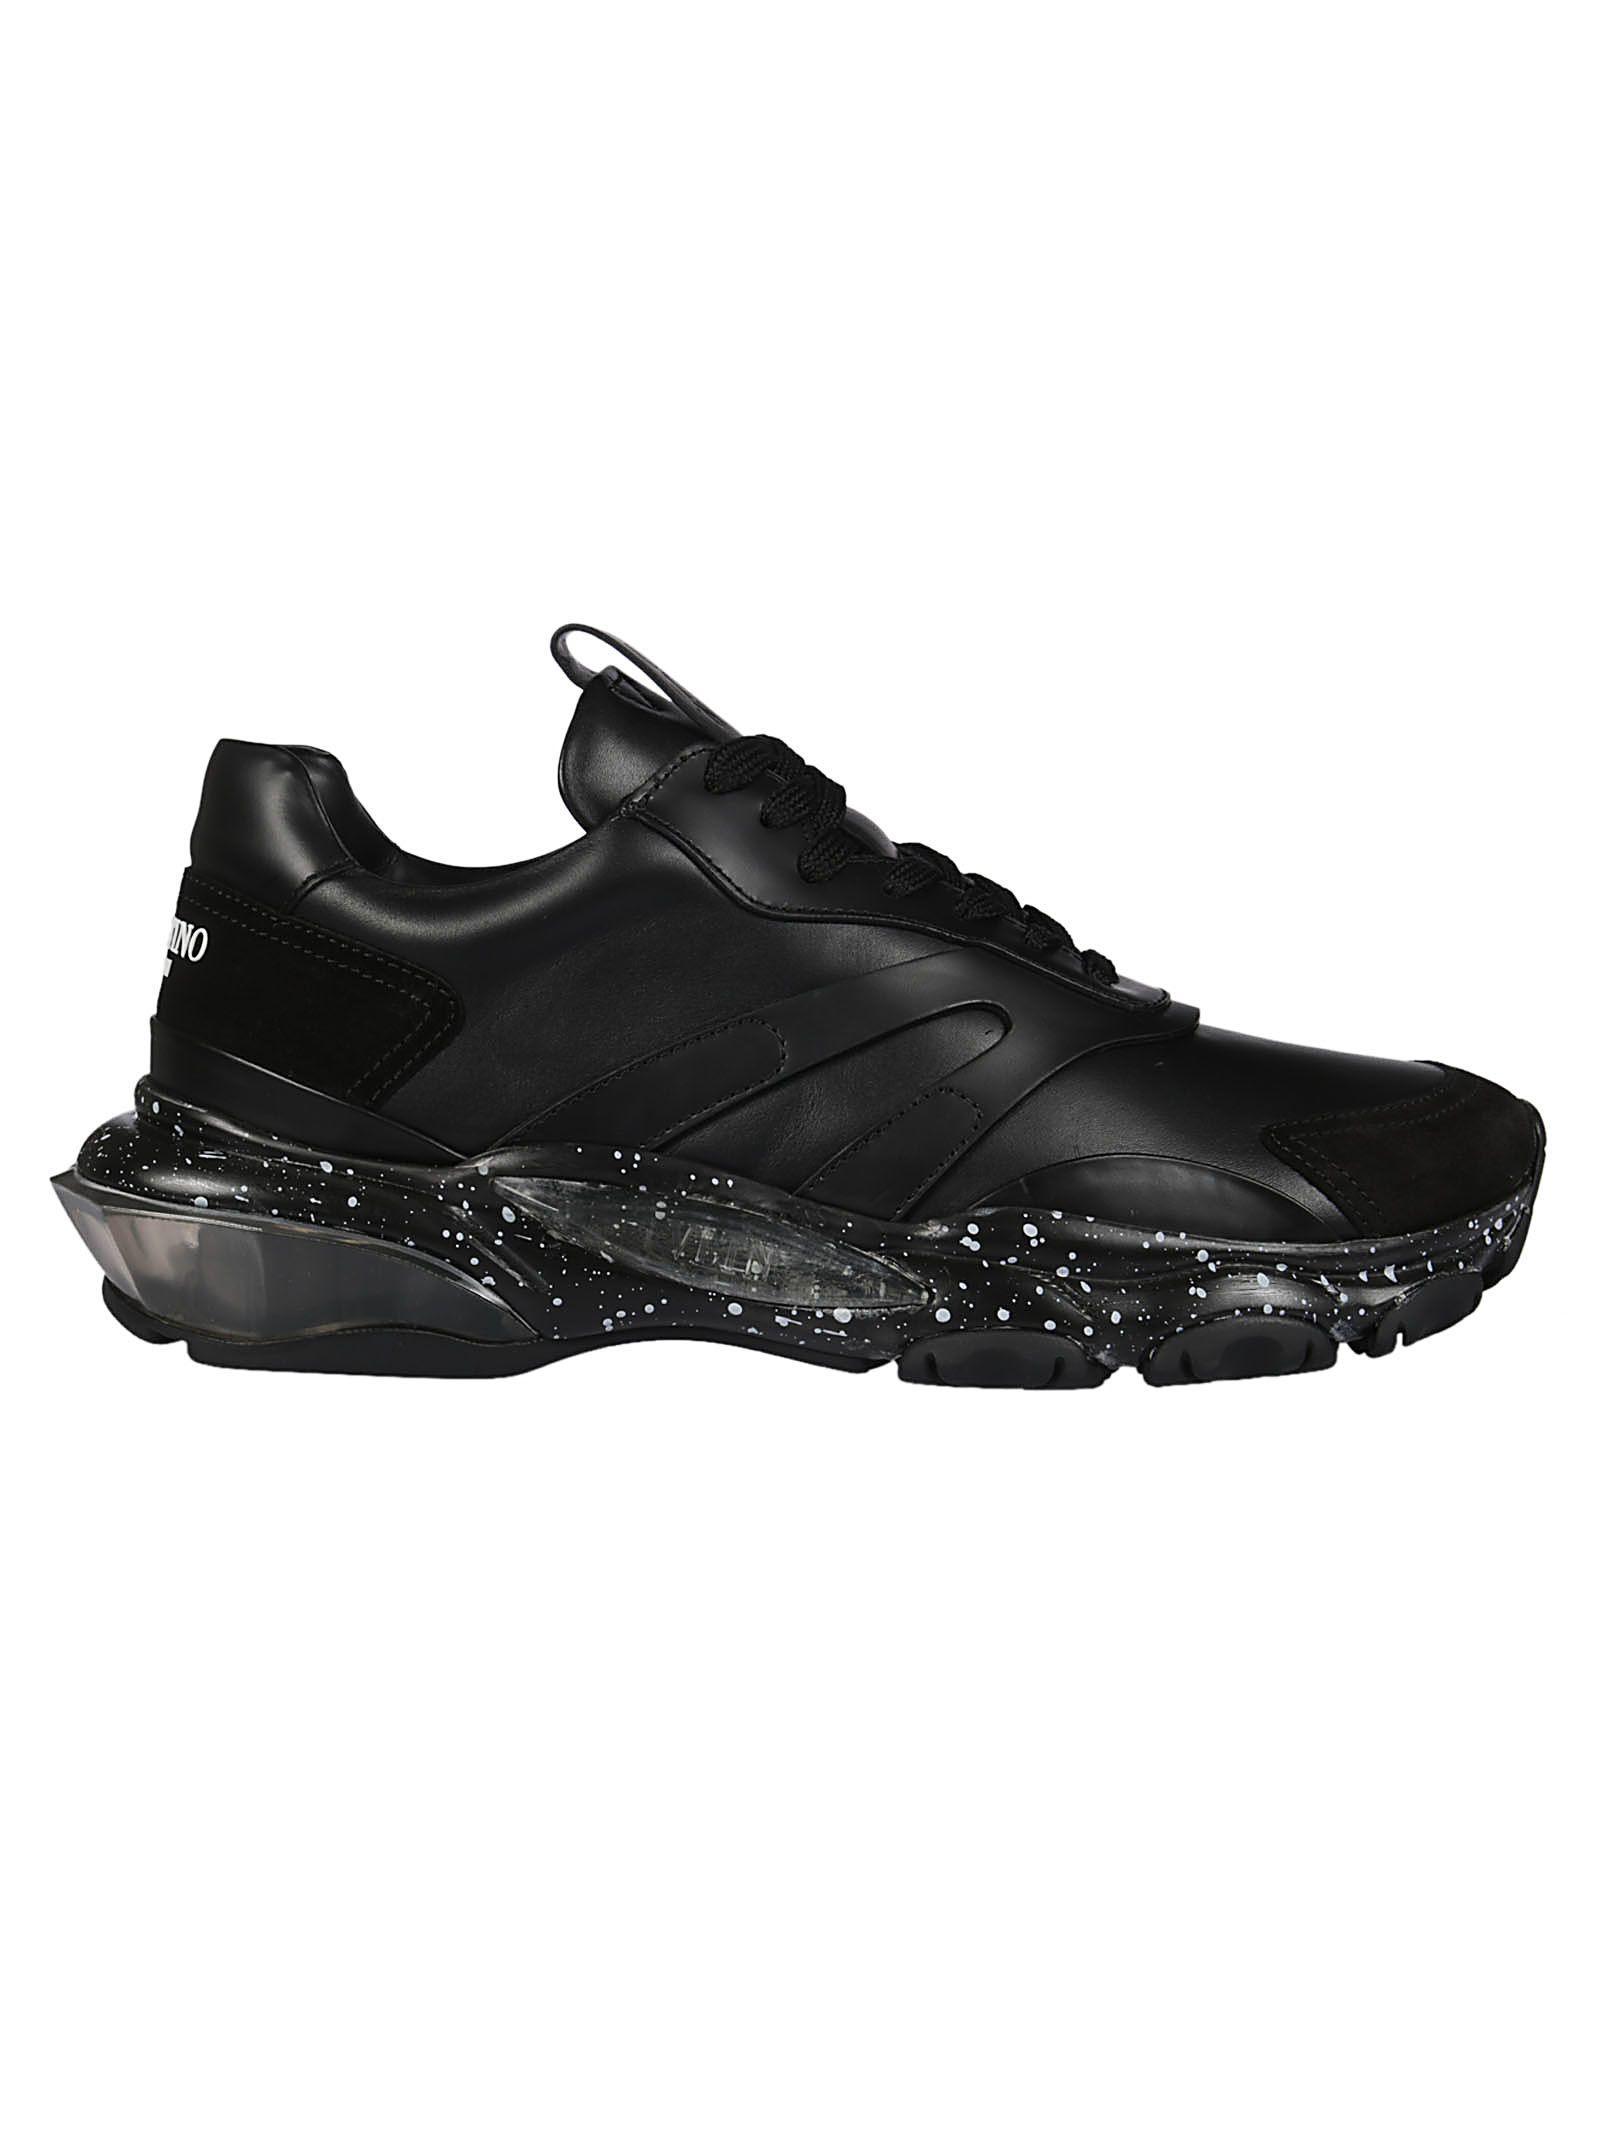 fdc7cb0f56922 Valentino Garavani Bounce Suede-Trimmed Leather Sneakers - Black ...